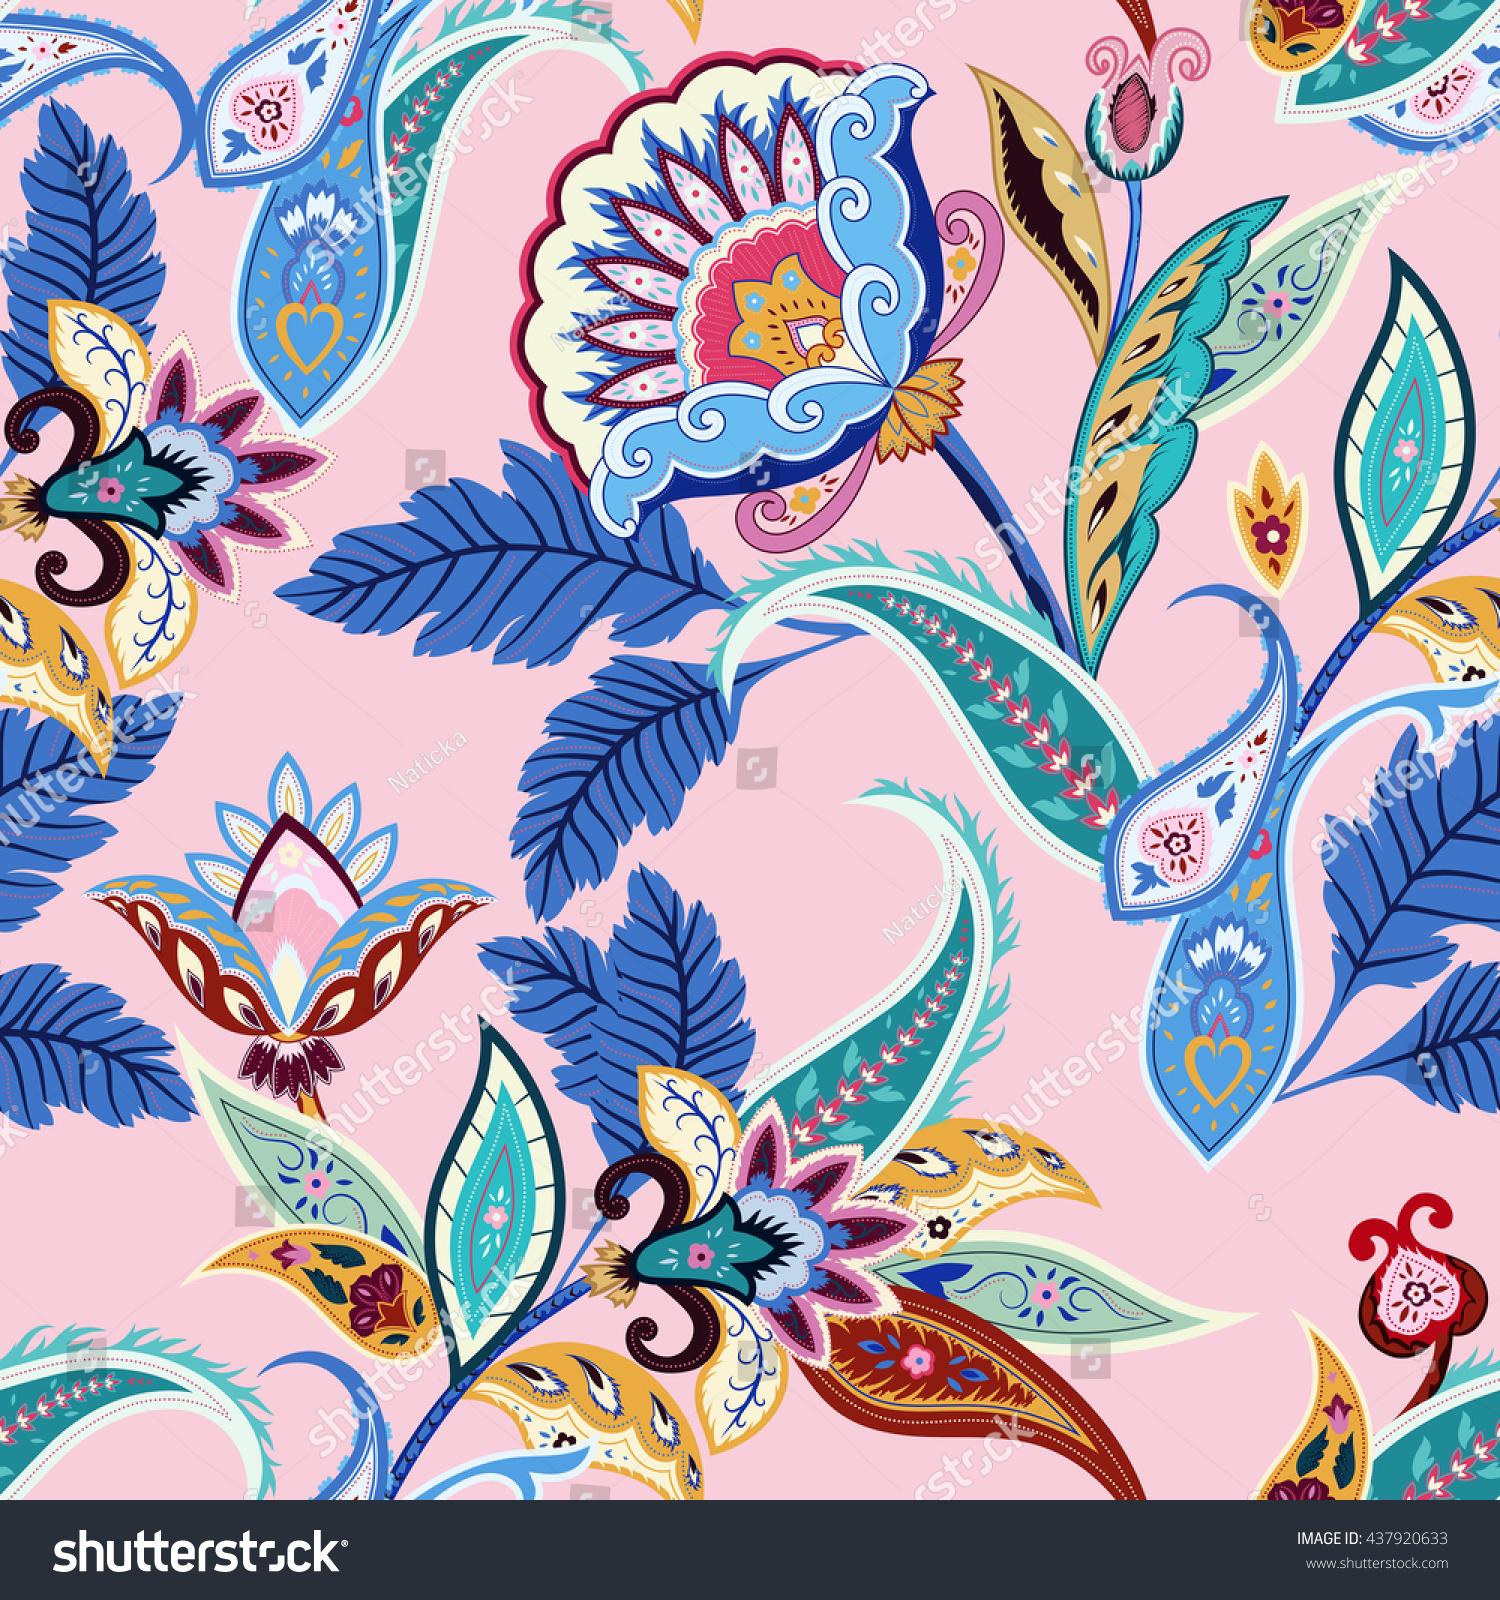 India Seamless Paisley Pattern Retro Stylized Royalty Free Stock